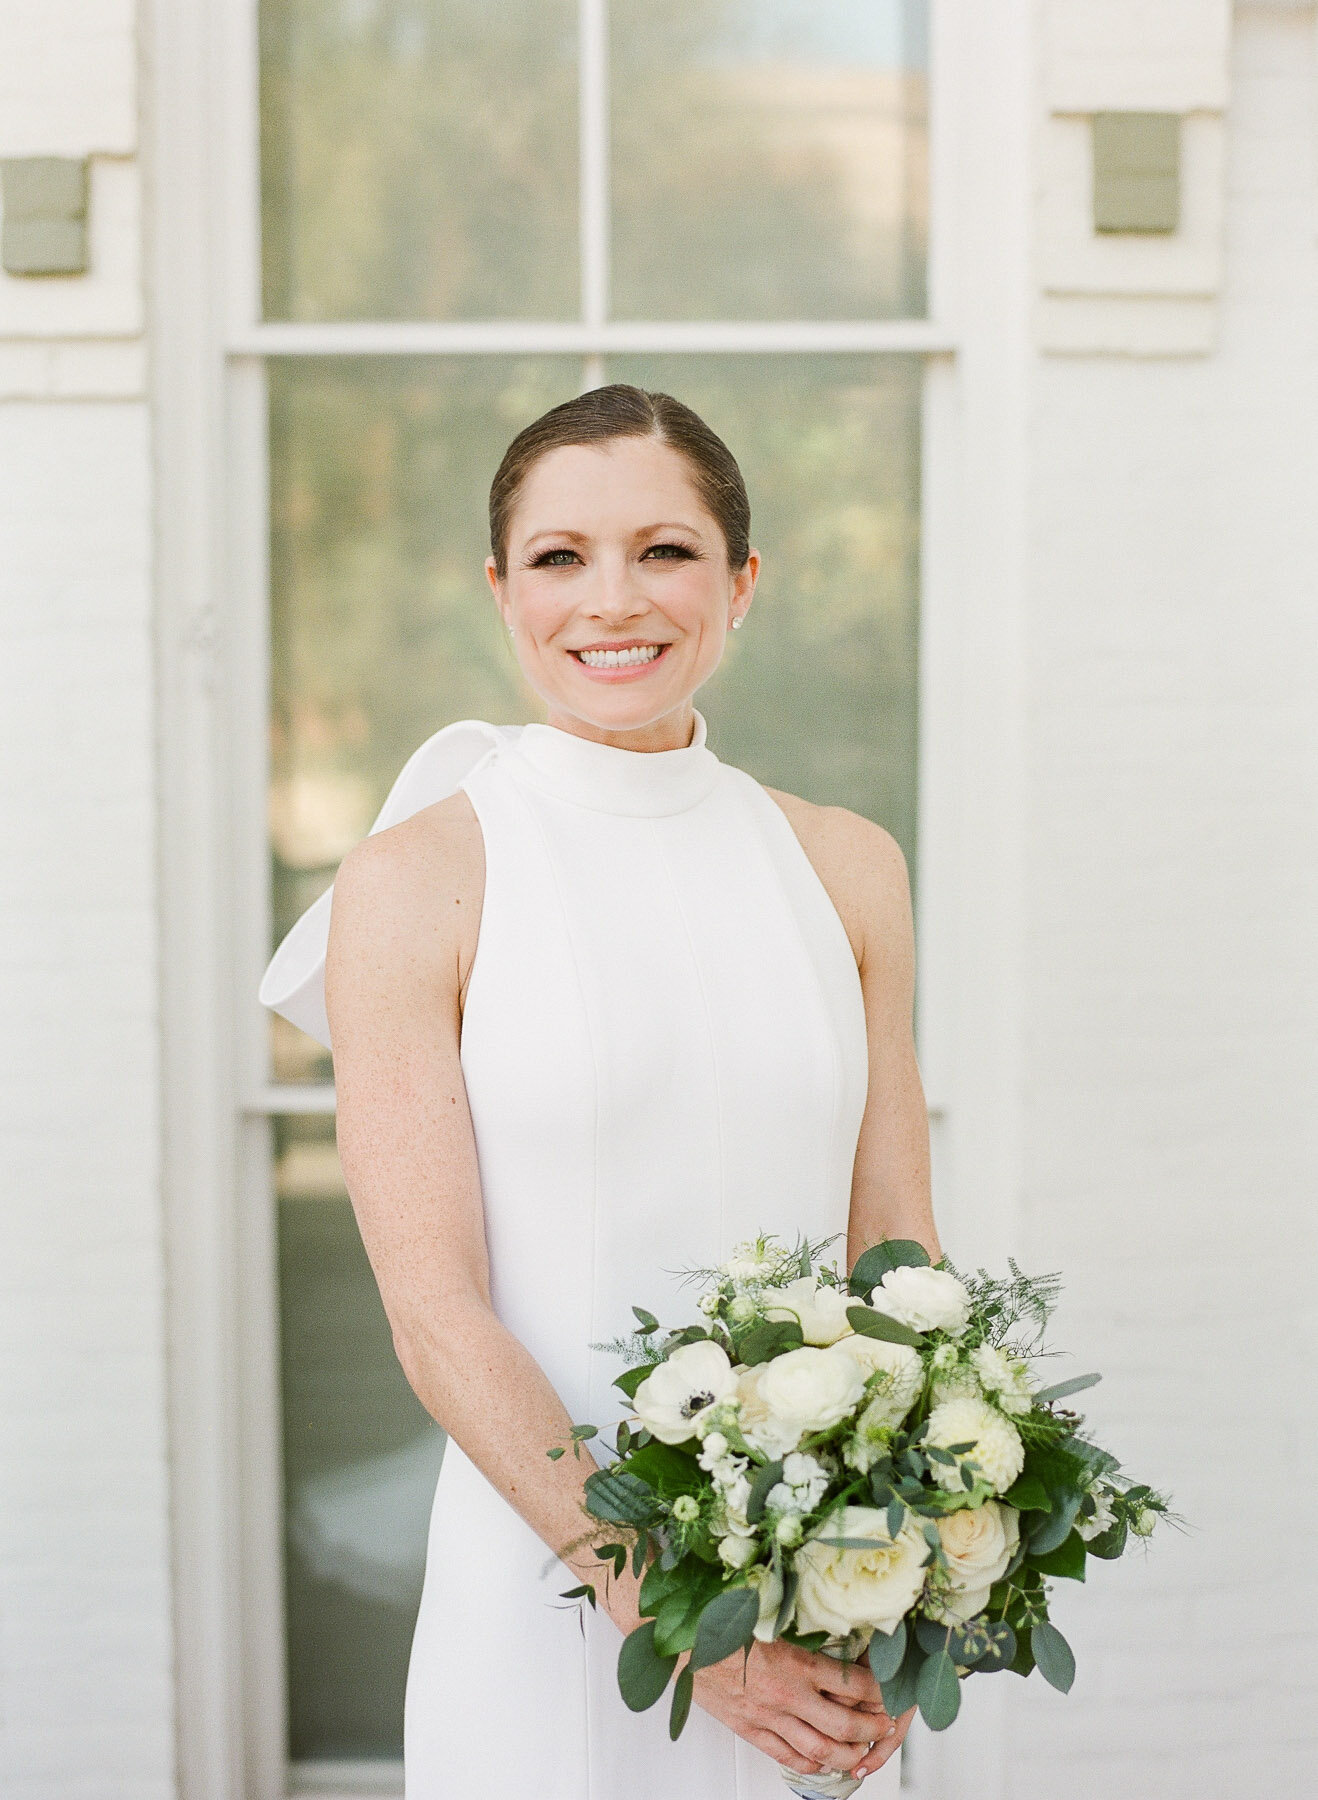 Adelphi Saratoga Wedding by Michelle Lange Photography-17.jpg